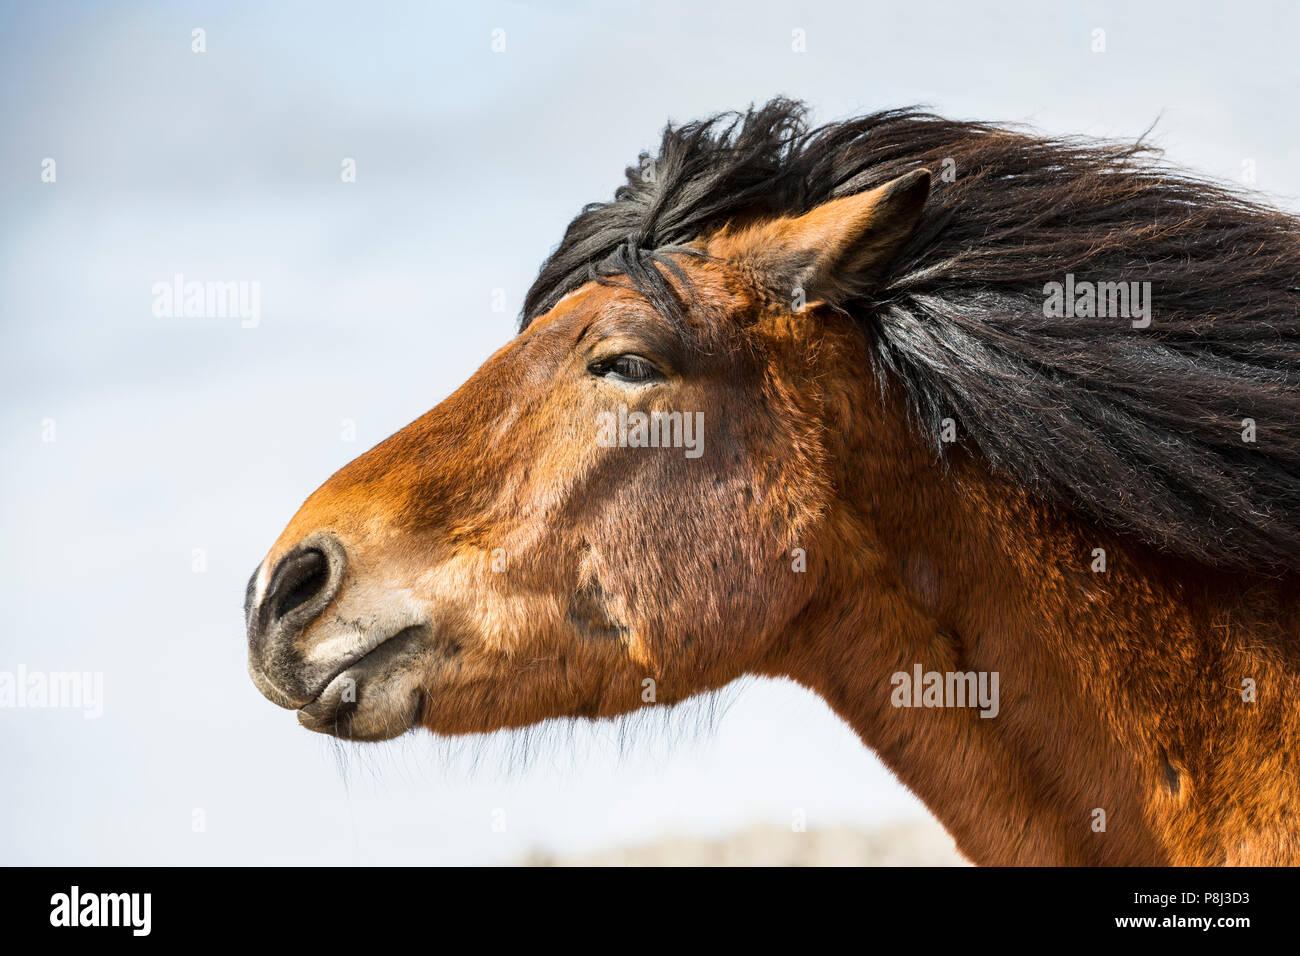 Horse head close up, Iceland horse - Stock Image